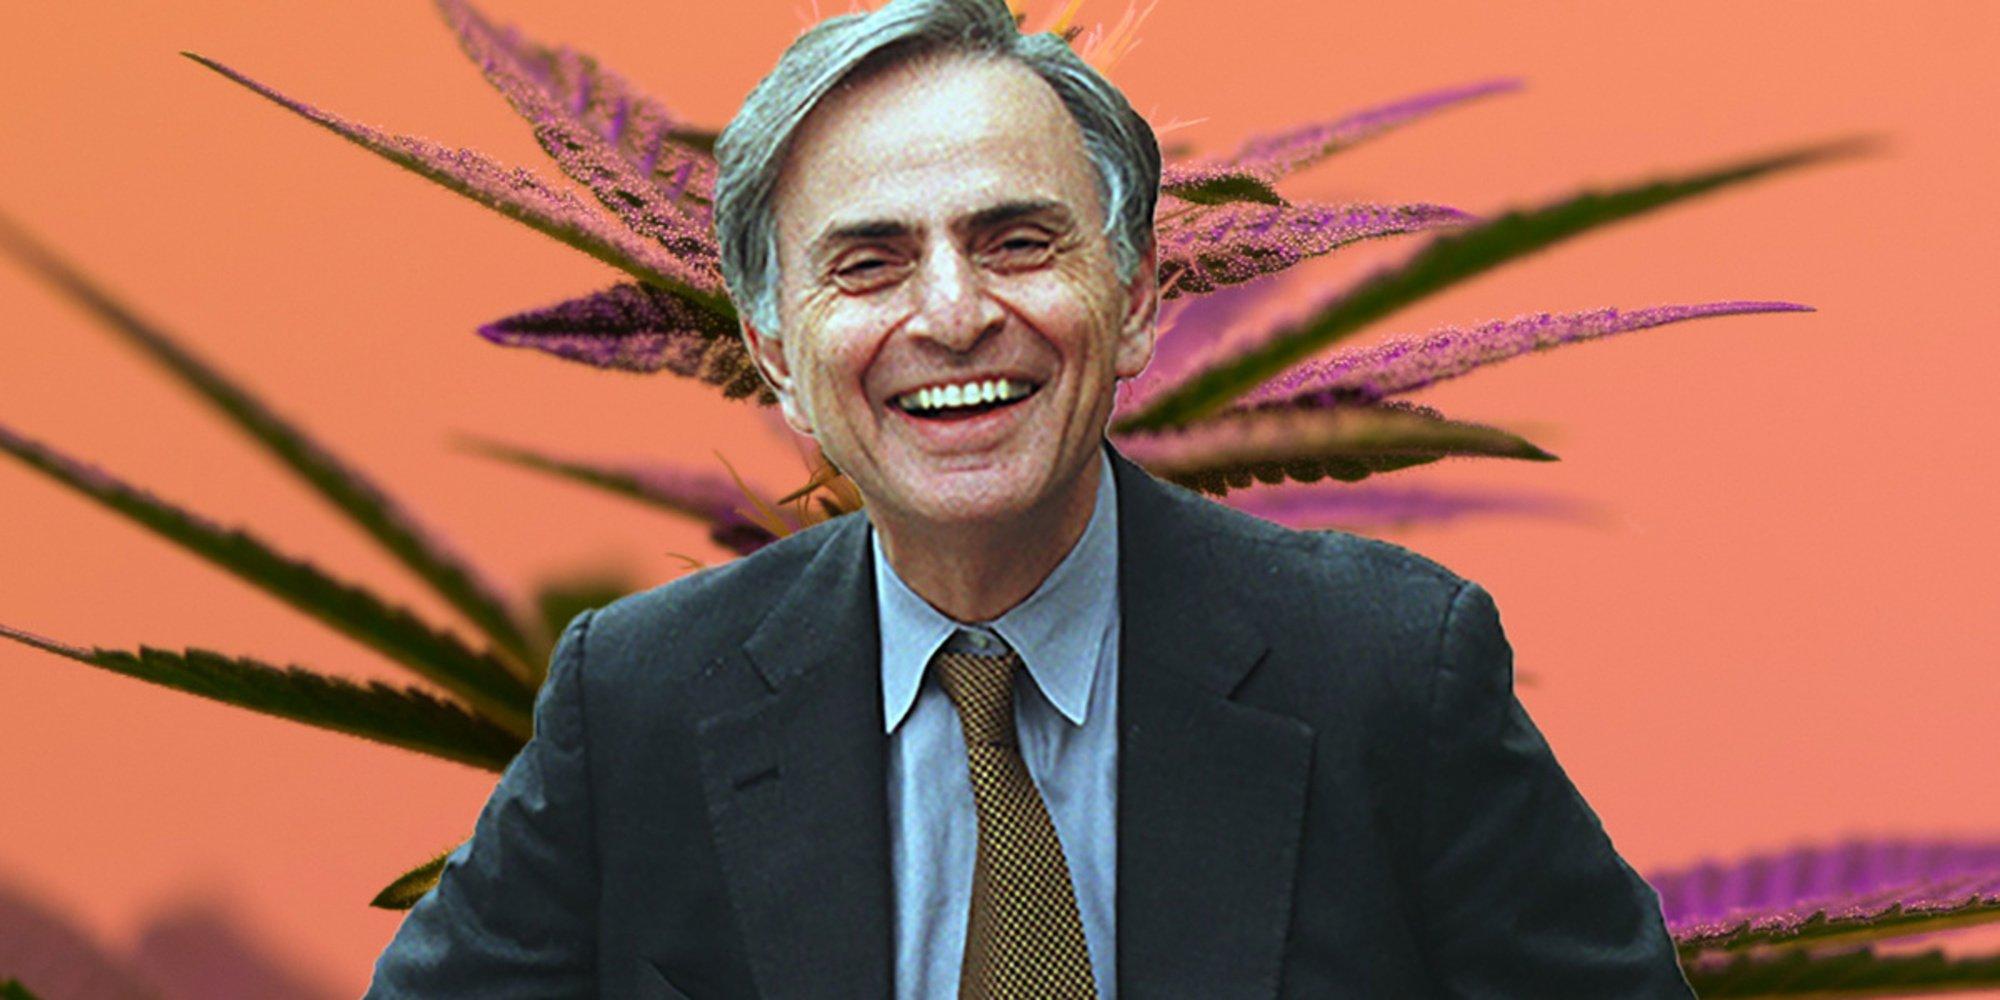 Carl Sagan on why he liked smoking marijuana